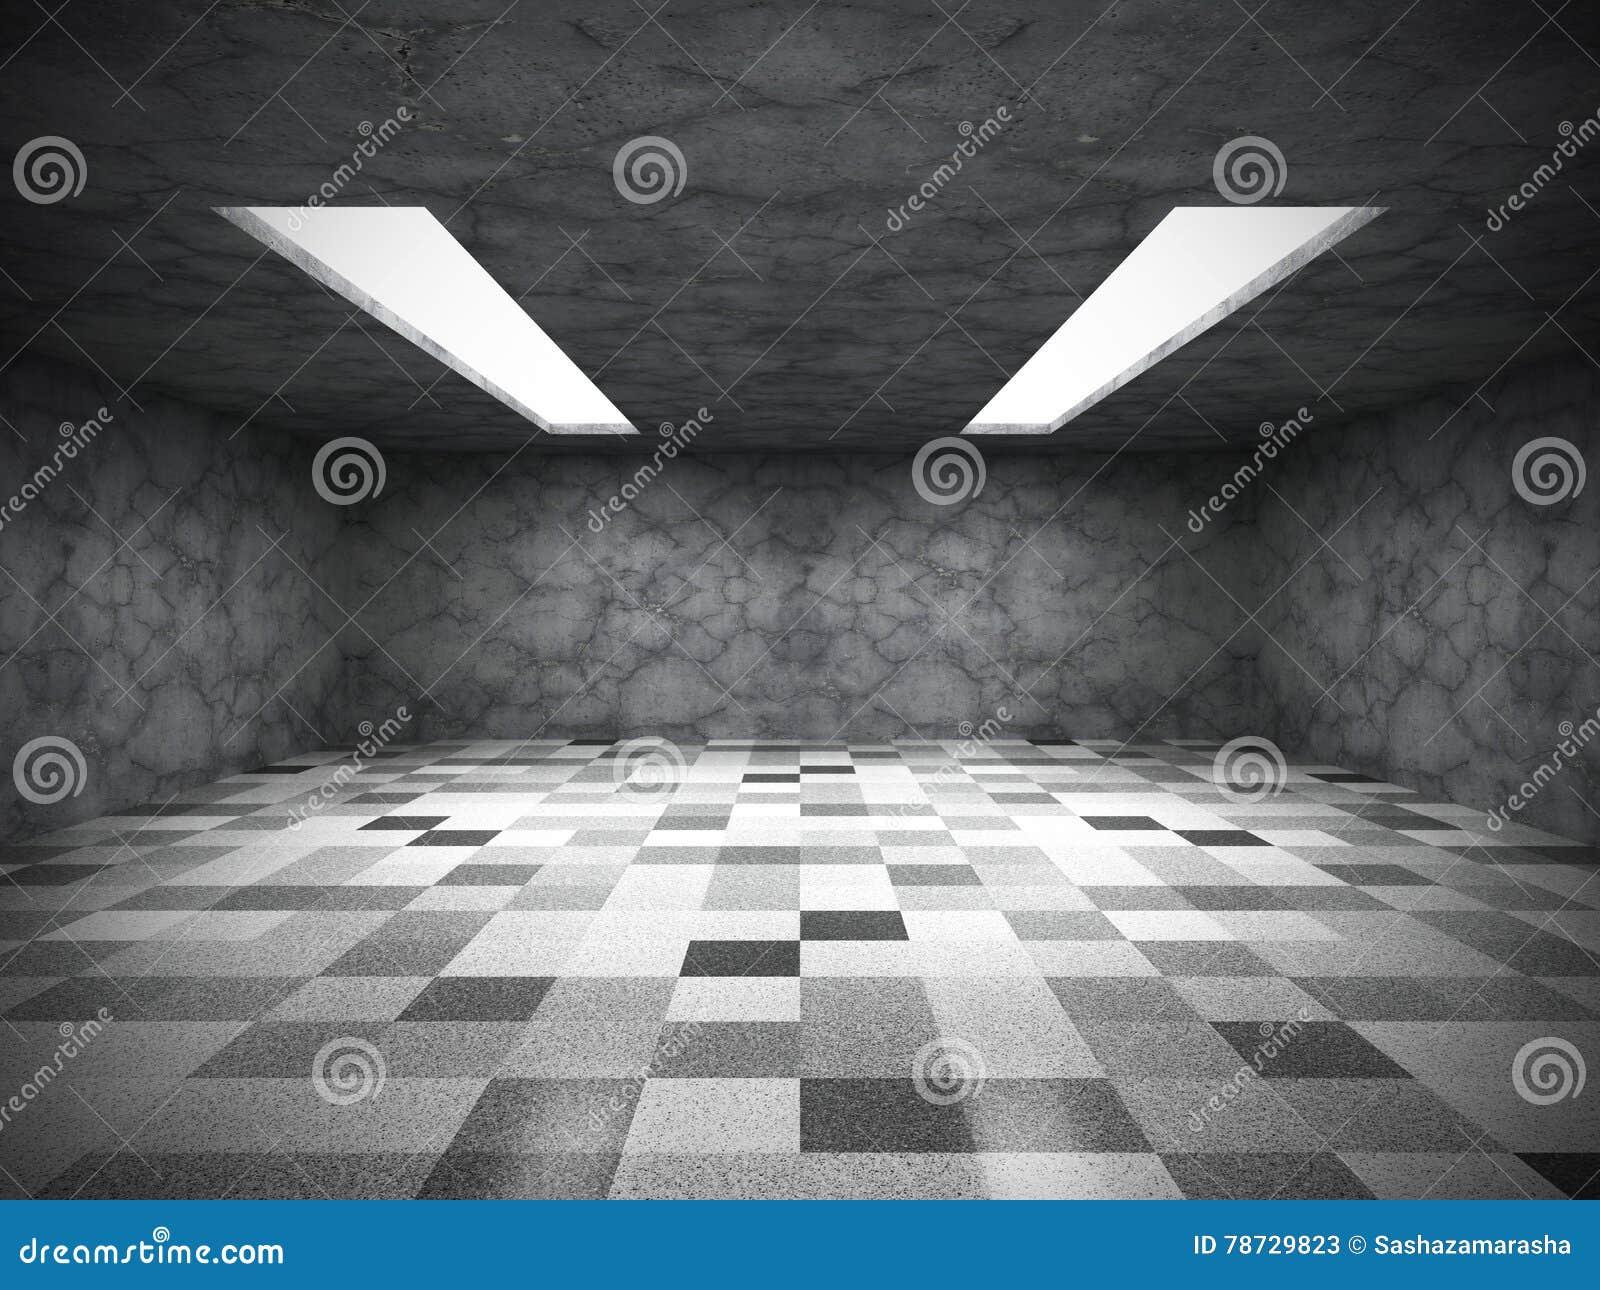 Konkret mörker tömmer rum med tegelplattagolvet abstrakt arkitektur